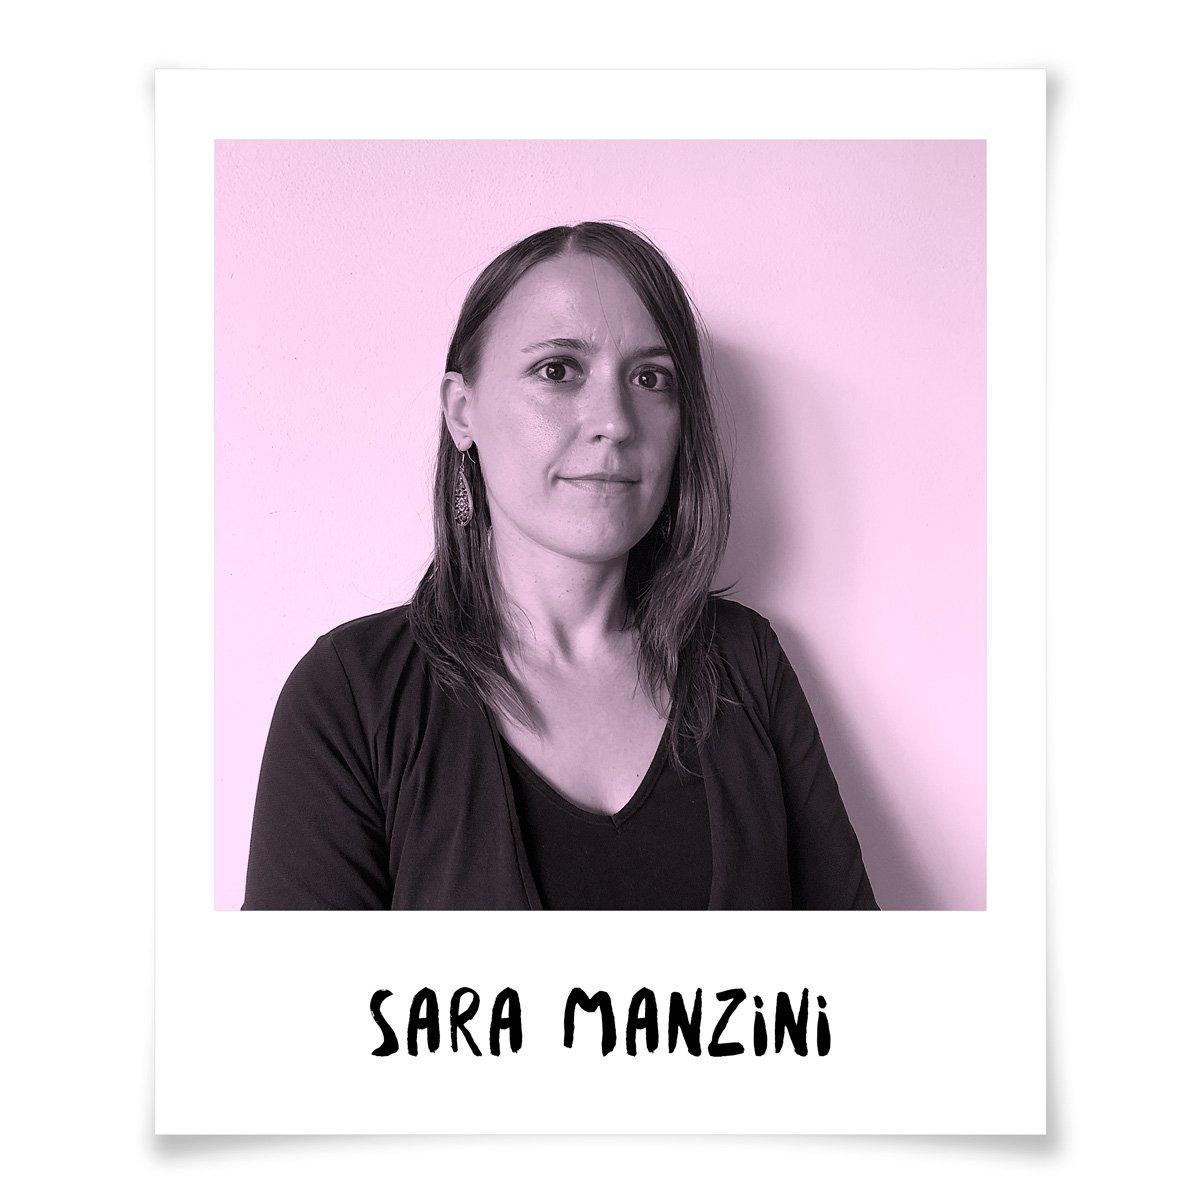 Sara_manzini_ok